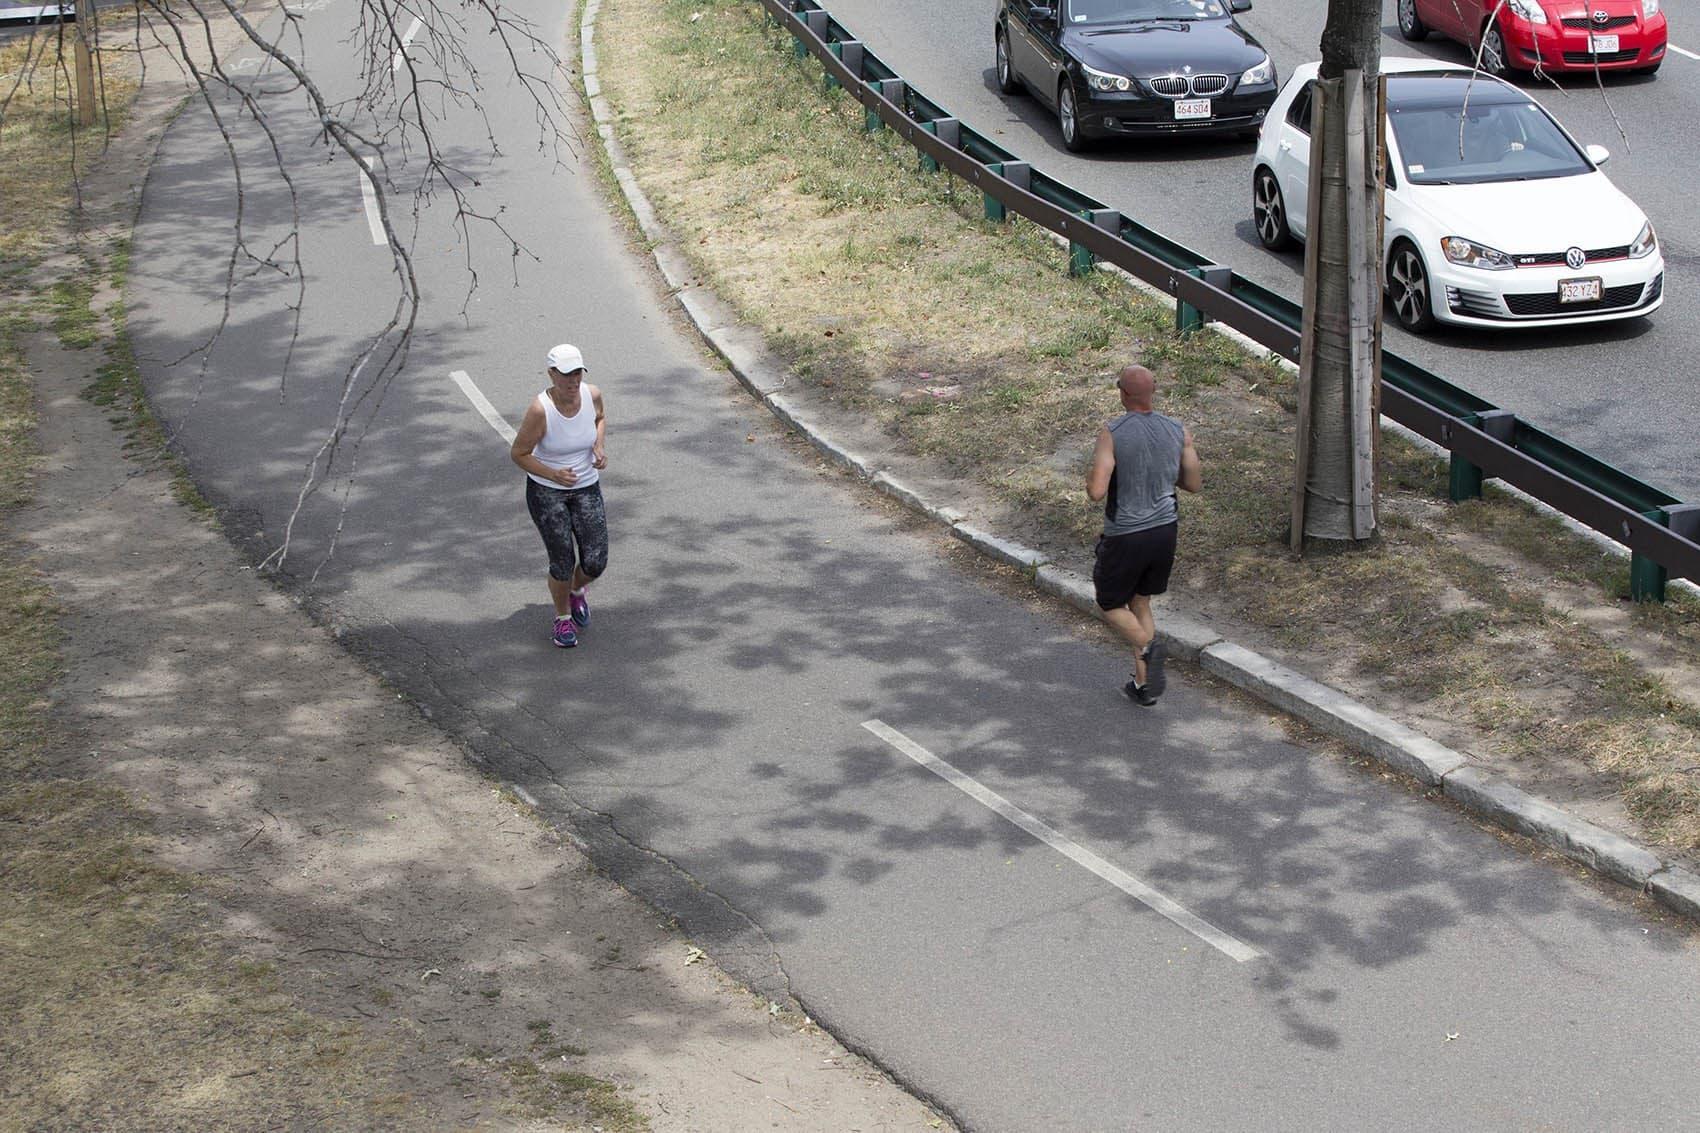 People run along on the Esplanade in Boston. (Joe Difazio for WBUR)